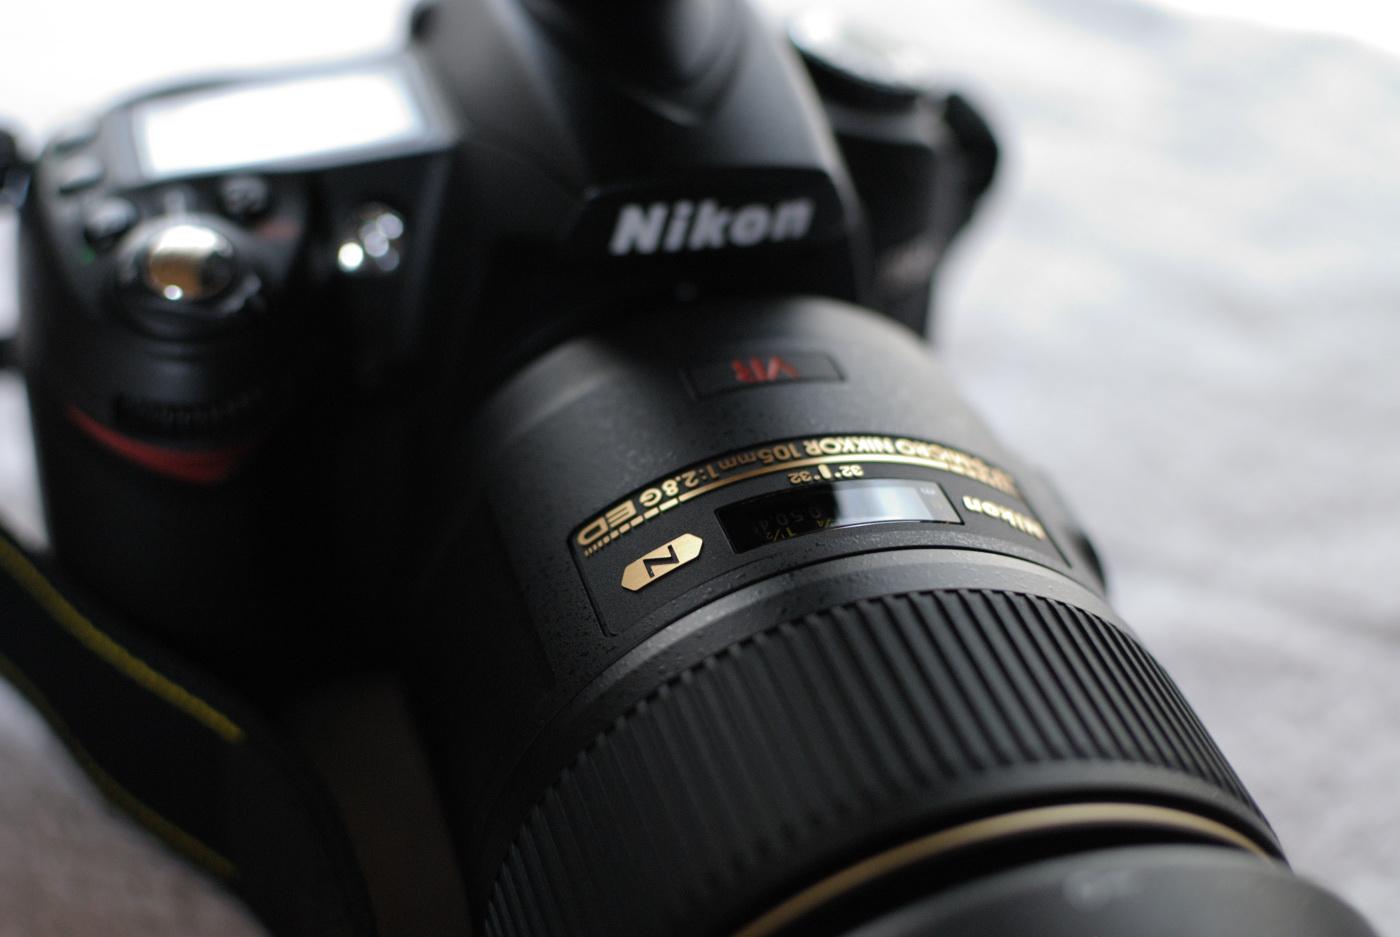 Nikon D90とAF-S VR Micro-Nikkor ED 105mm F2.8G (IF)